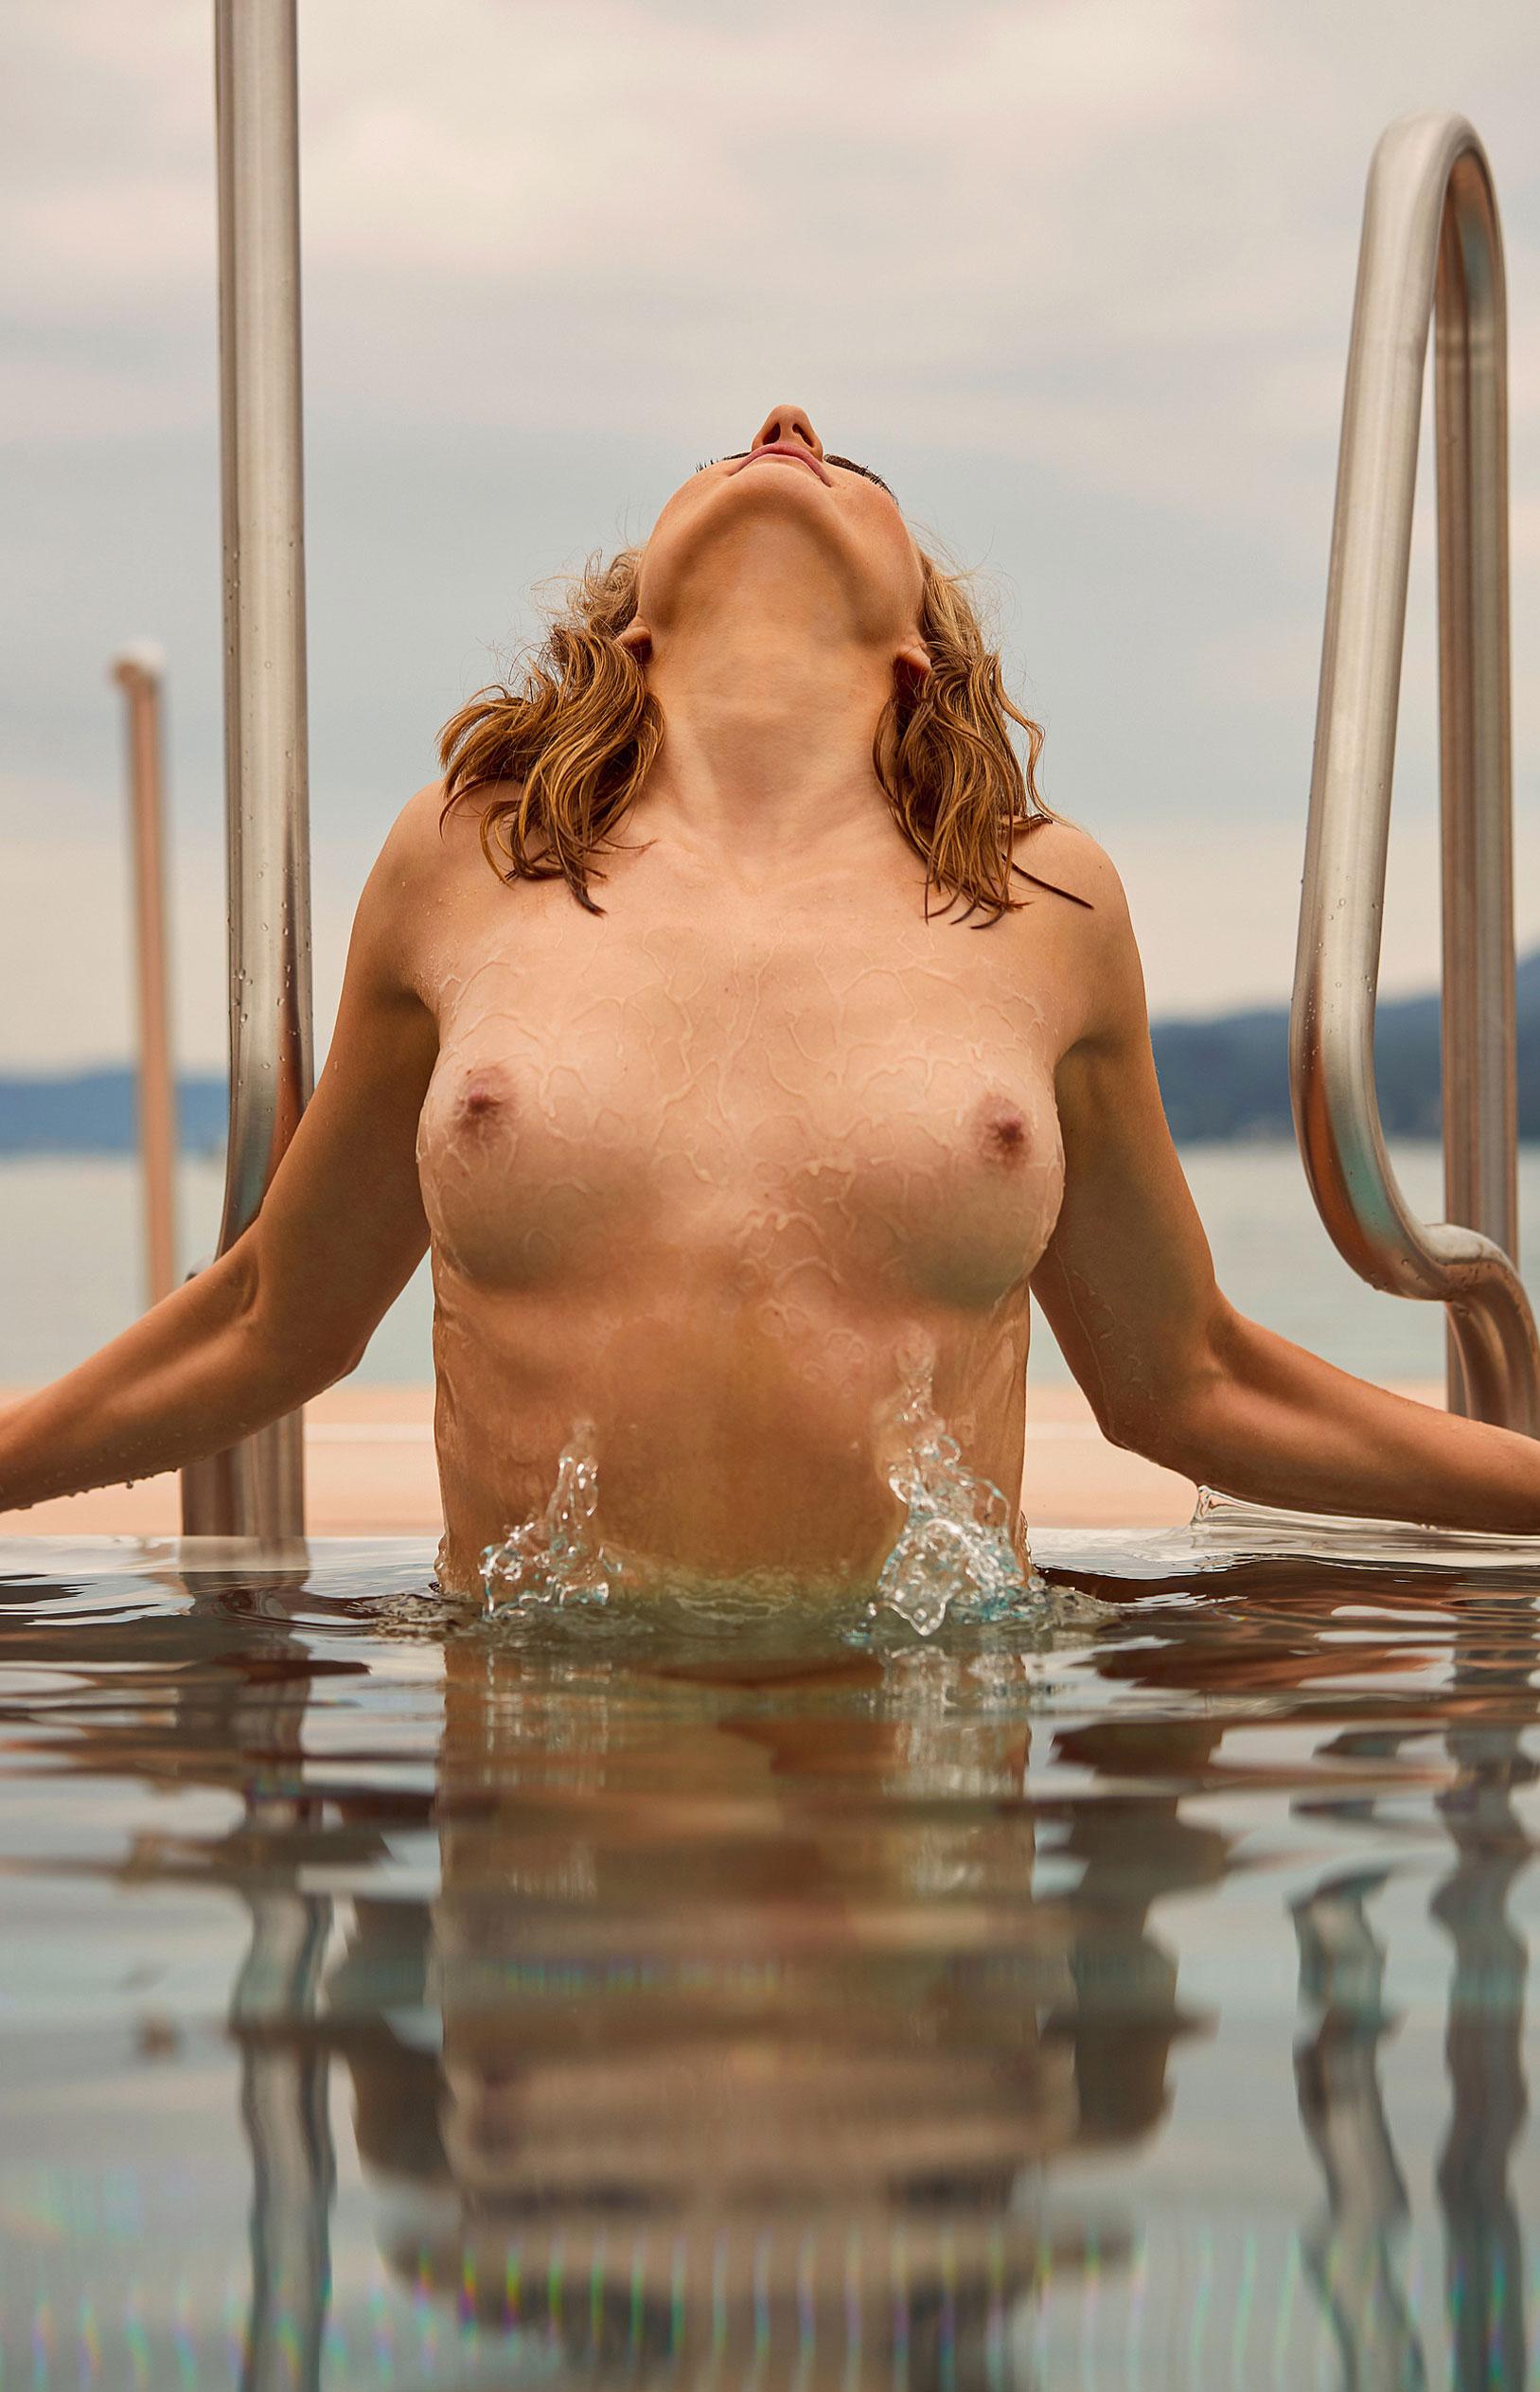 пловчиха Елена Кравцова в журнале Playboy Германия, октябрь 2020 / фото 11